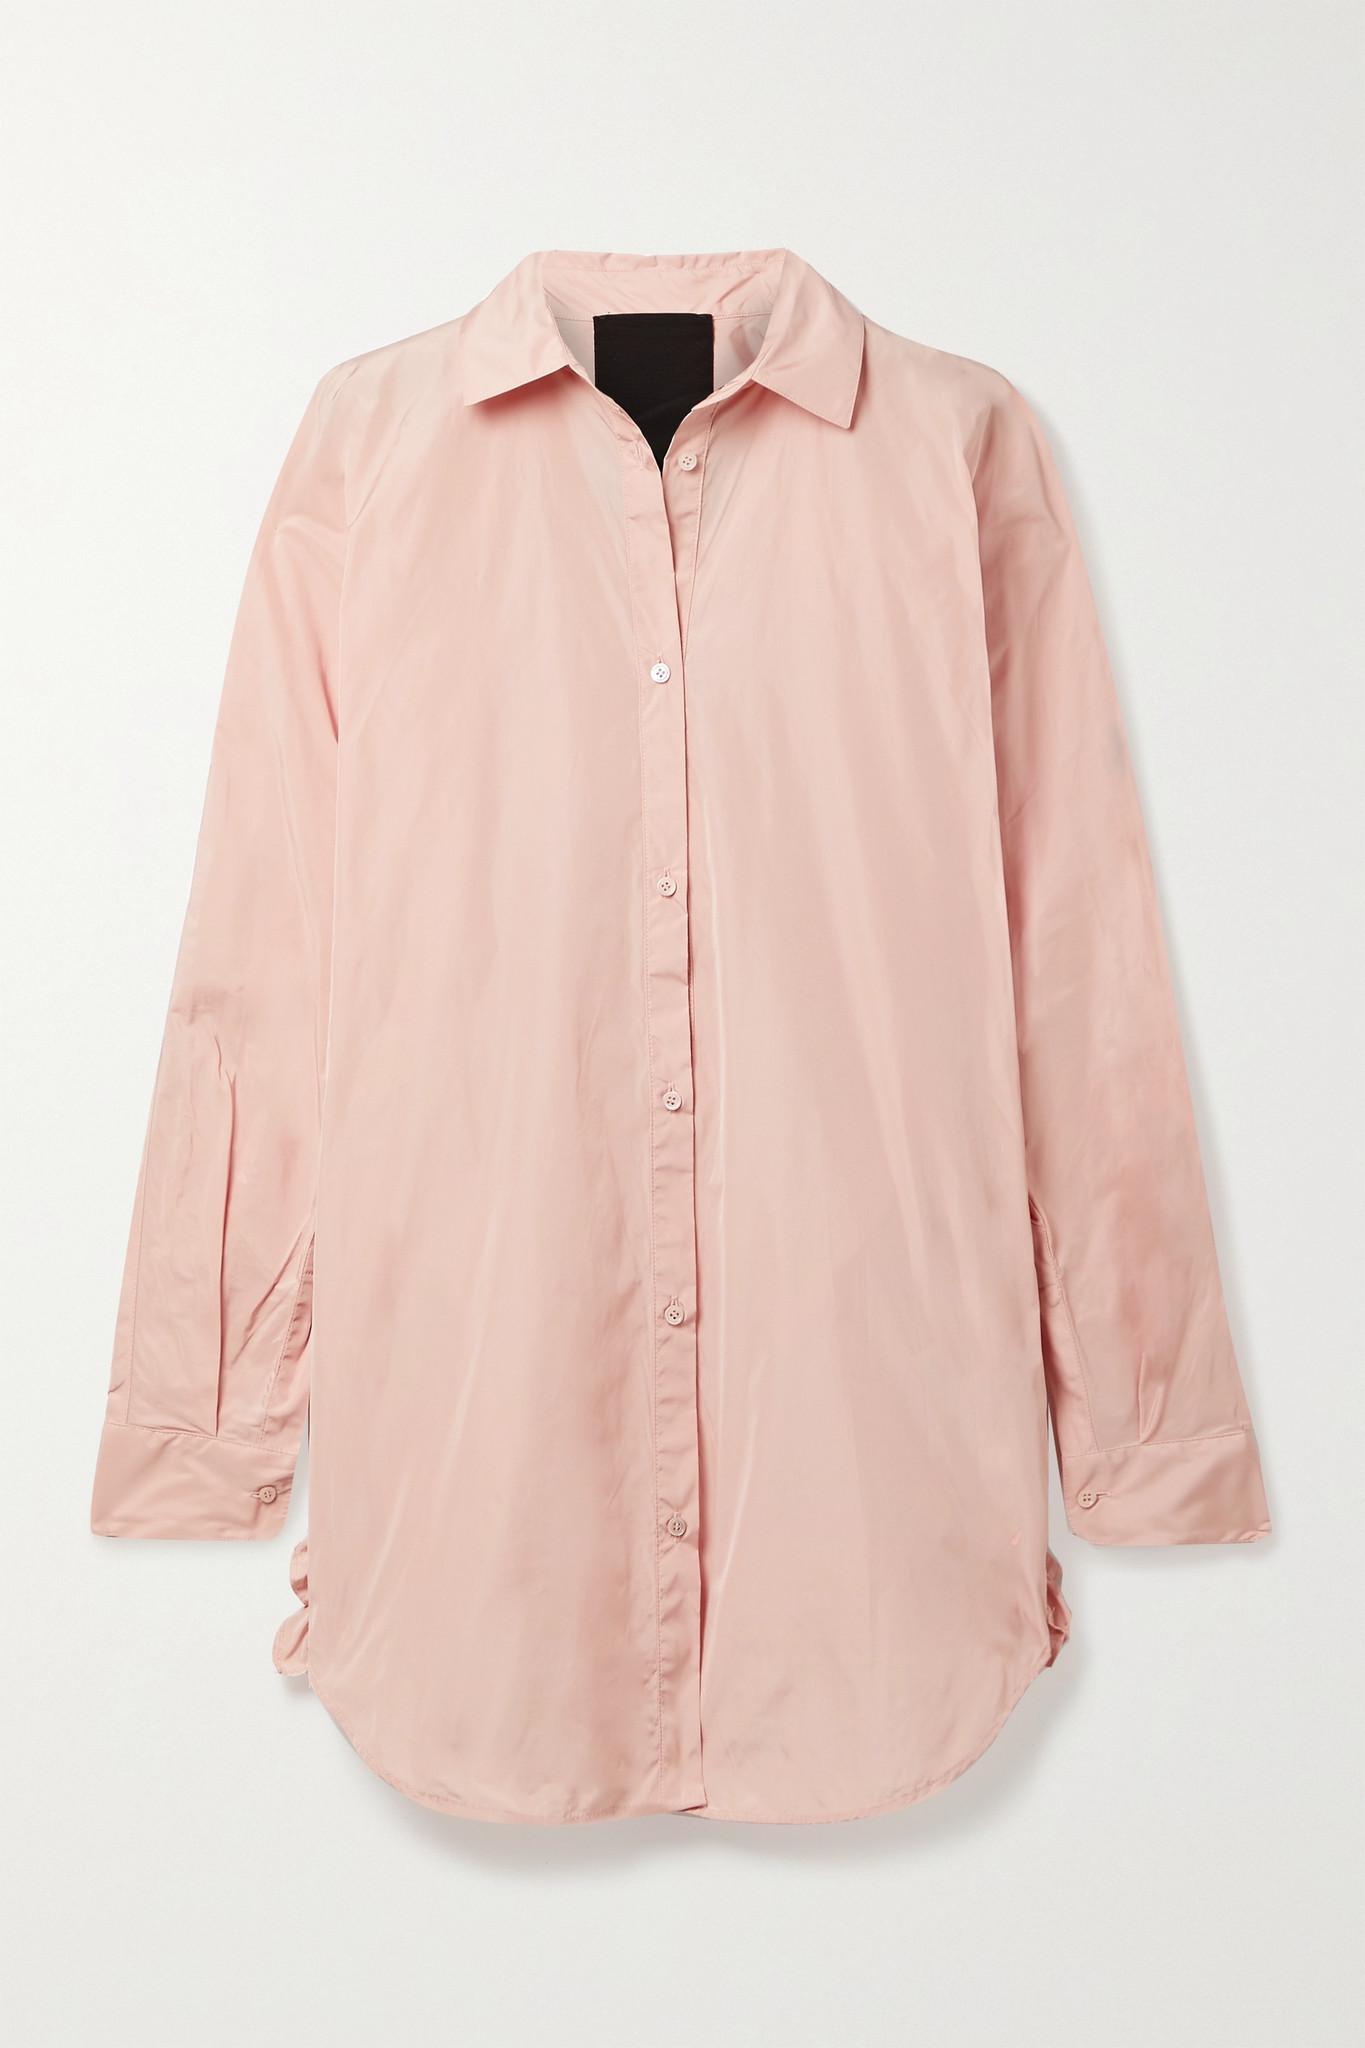 REDVALENTINO - Ruffled Taffeta Shirt - Pink - IT46